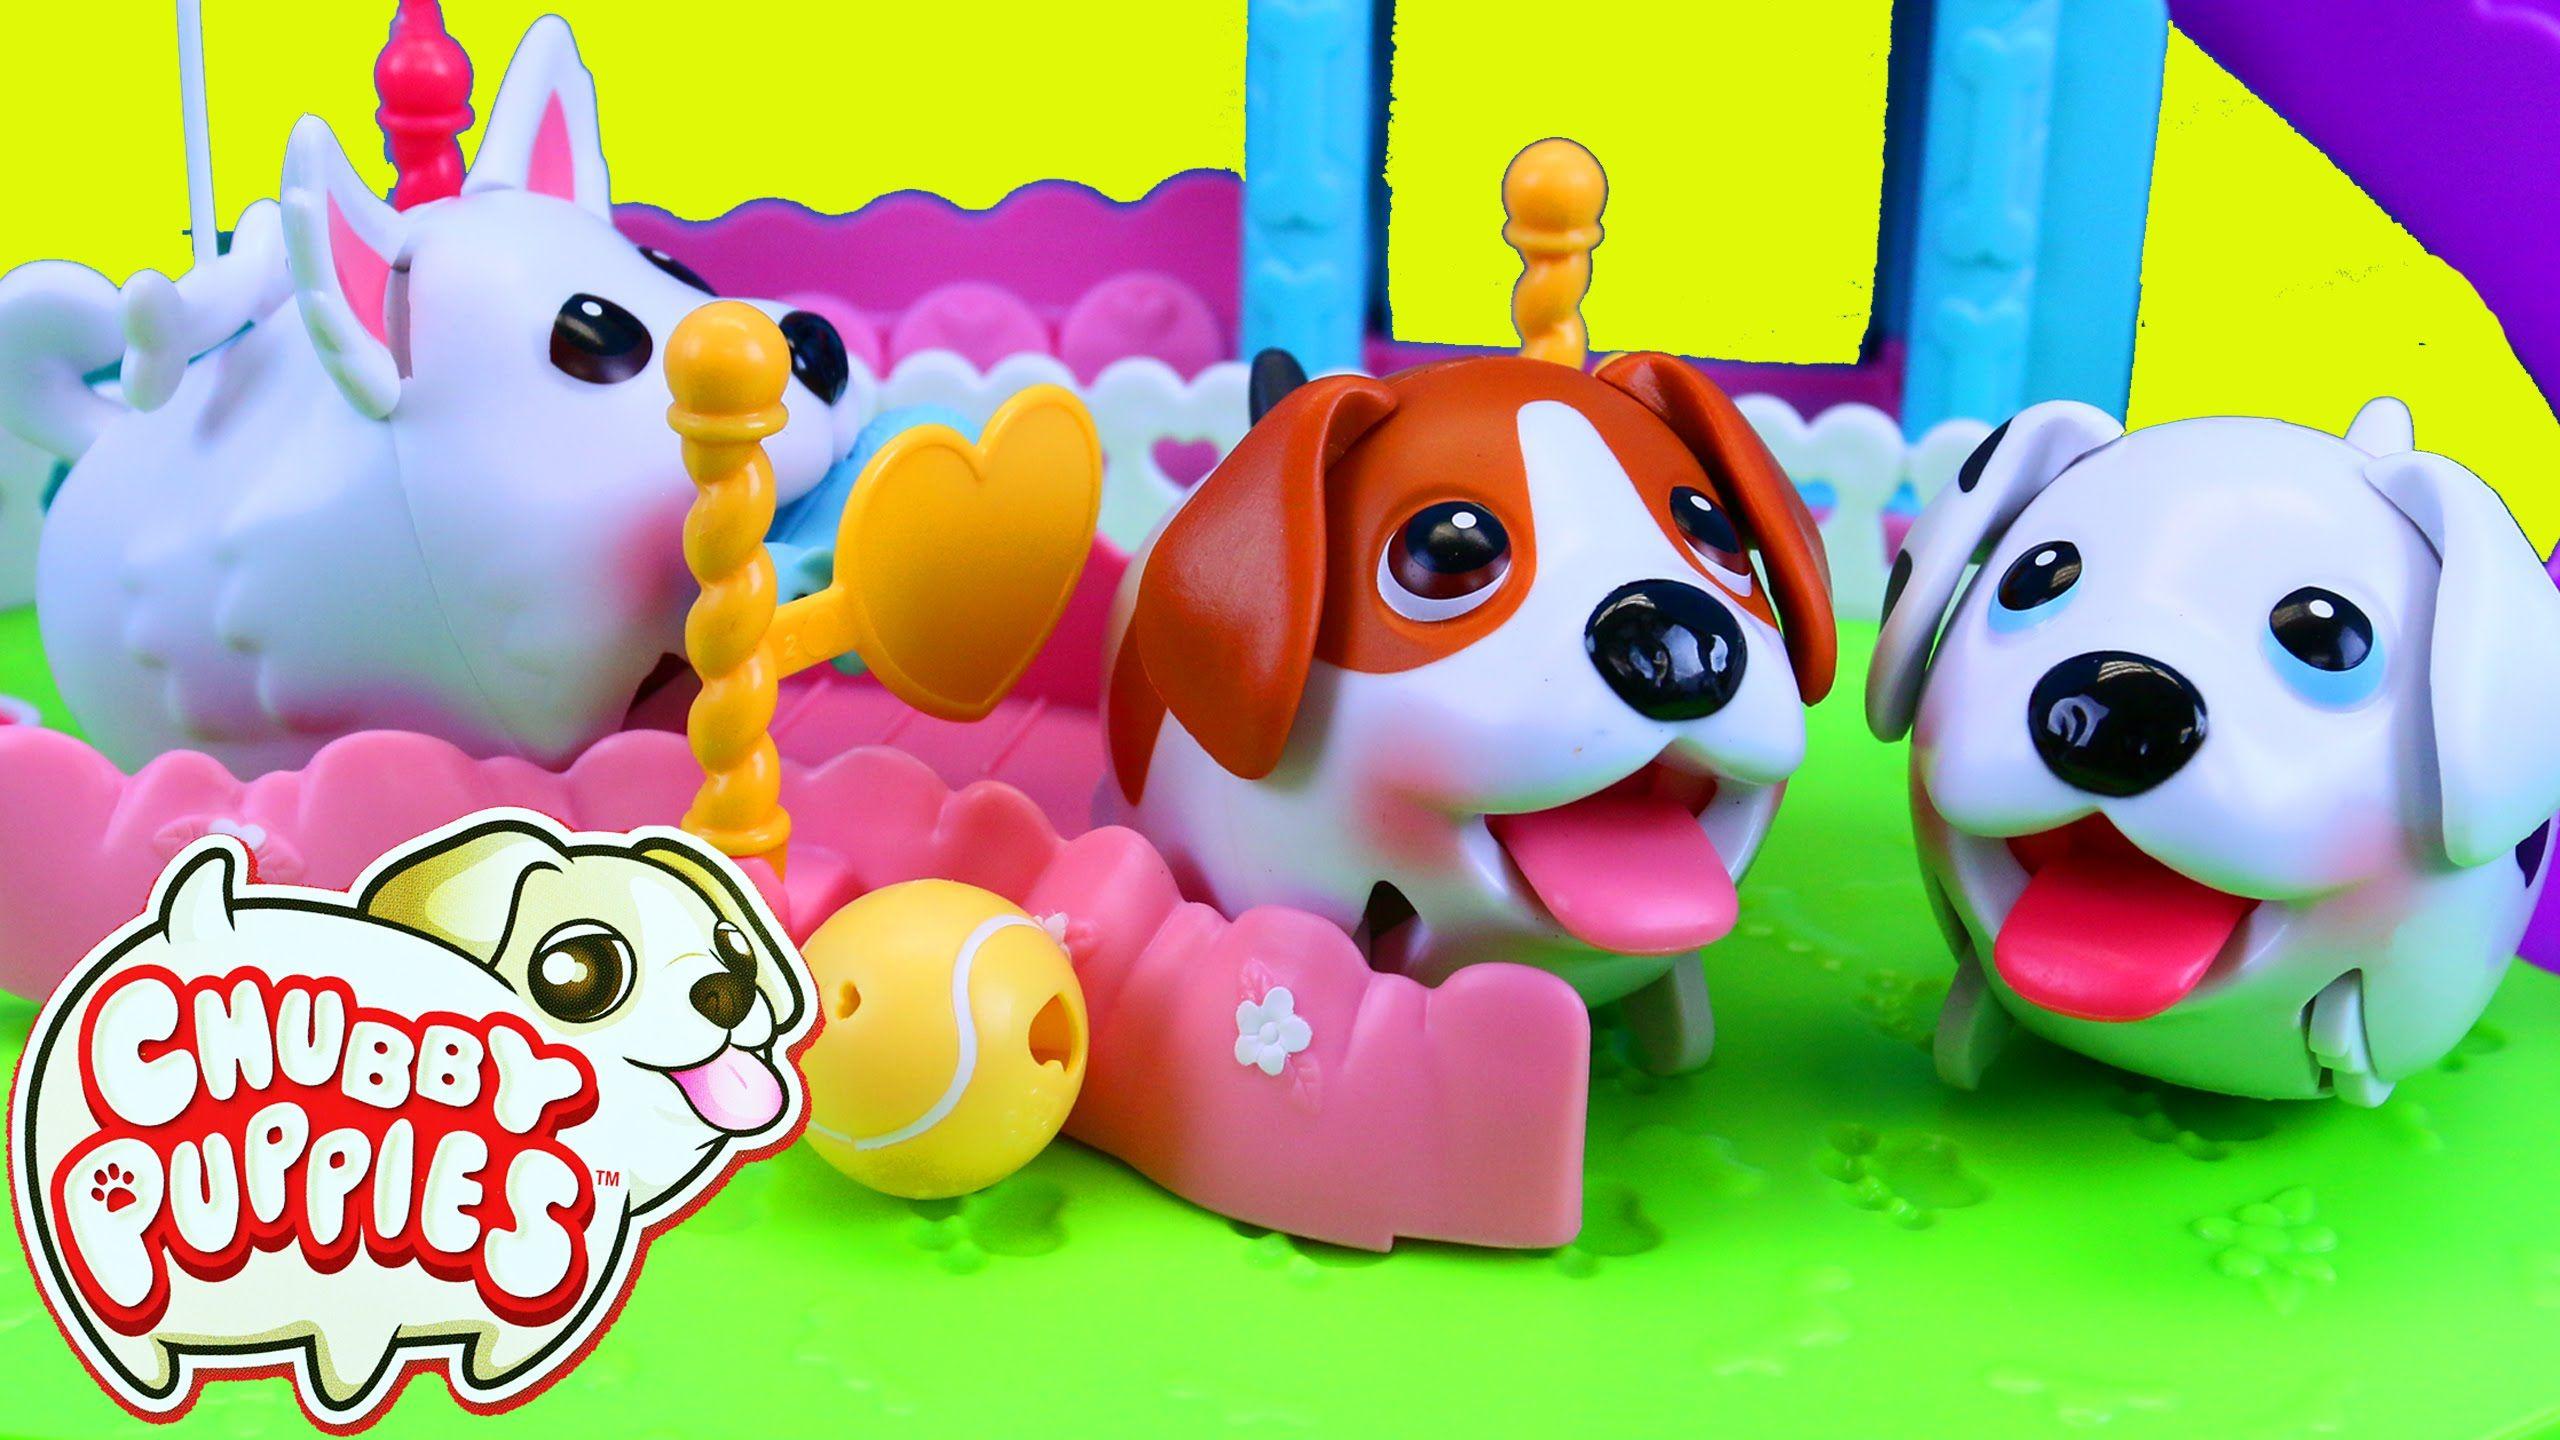 Popular Dalmation Chubby Adorable Dog - f5b52b17c2c43f2d485138fae35a4218  Collection_916070  .jpg